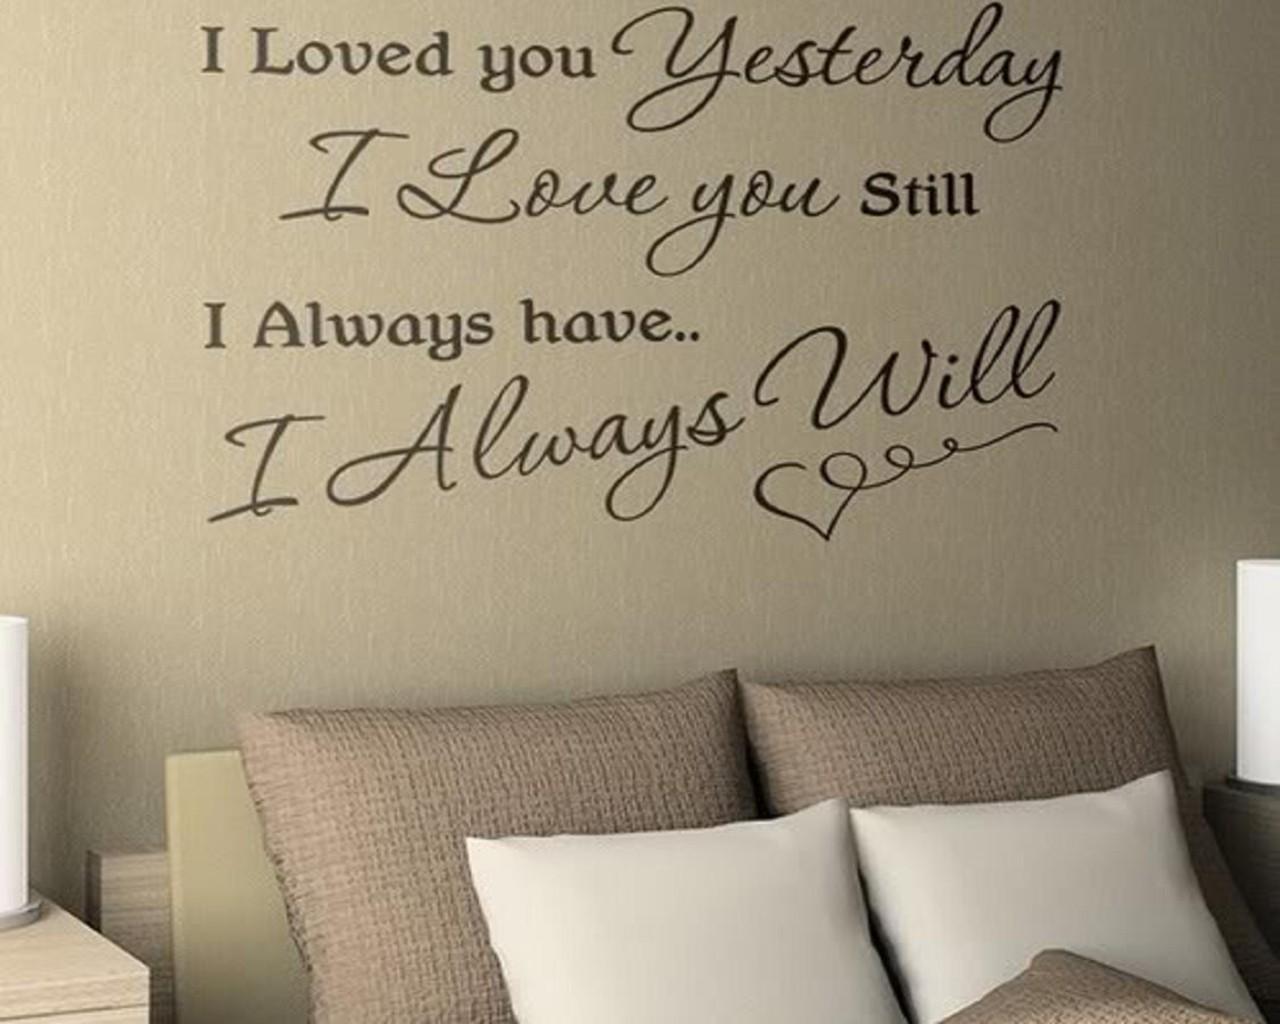 Love Quote Wallpapers for Desktop wallpaper Love Quote Wallpapers 1280x1024